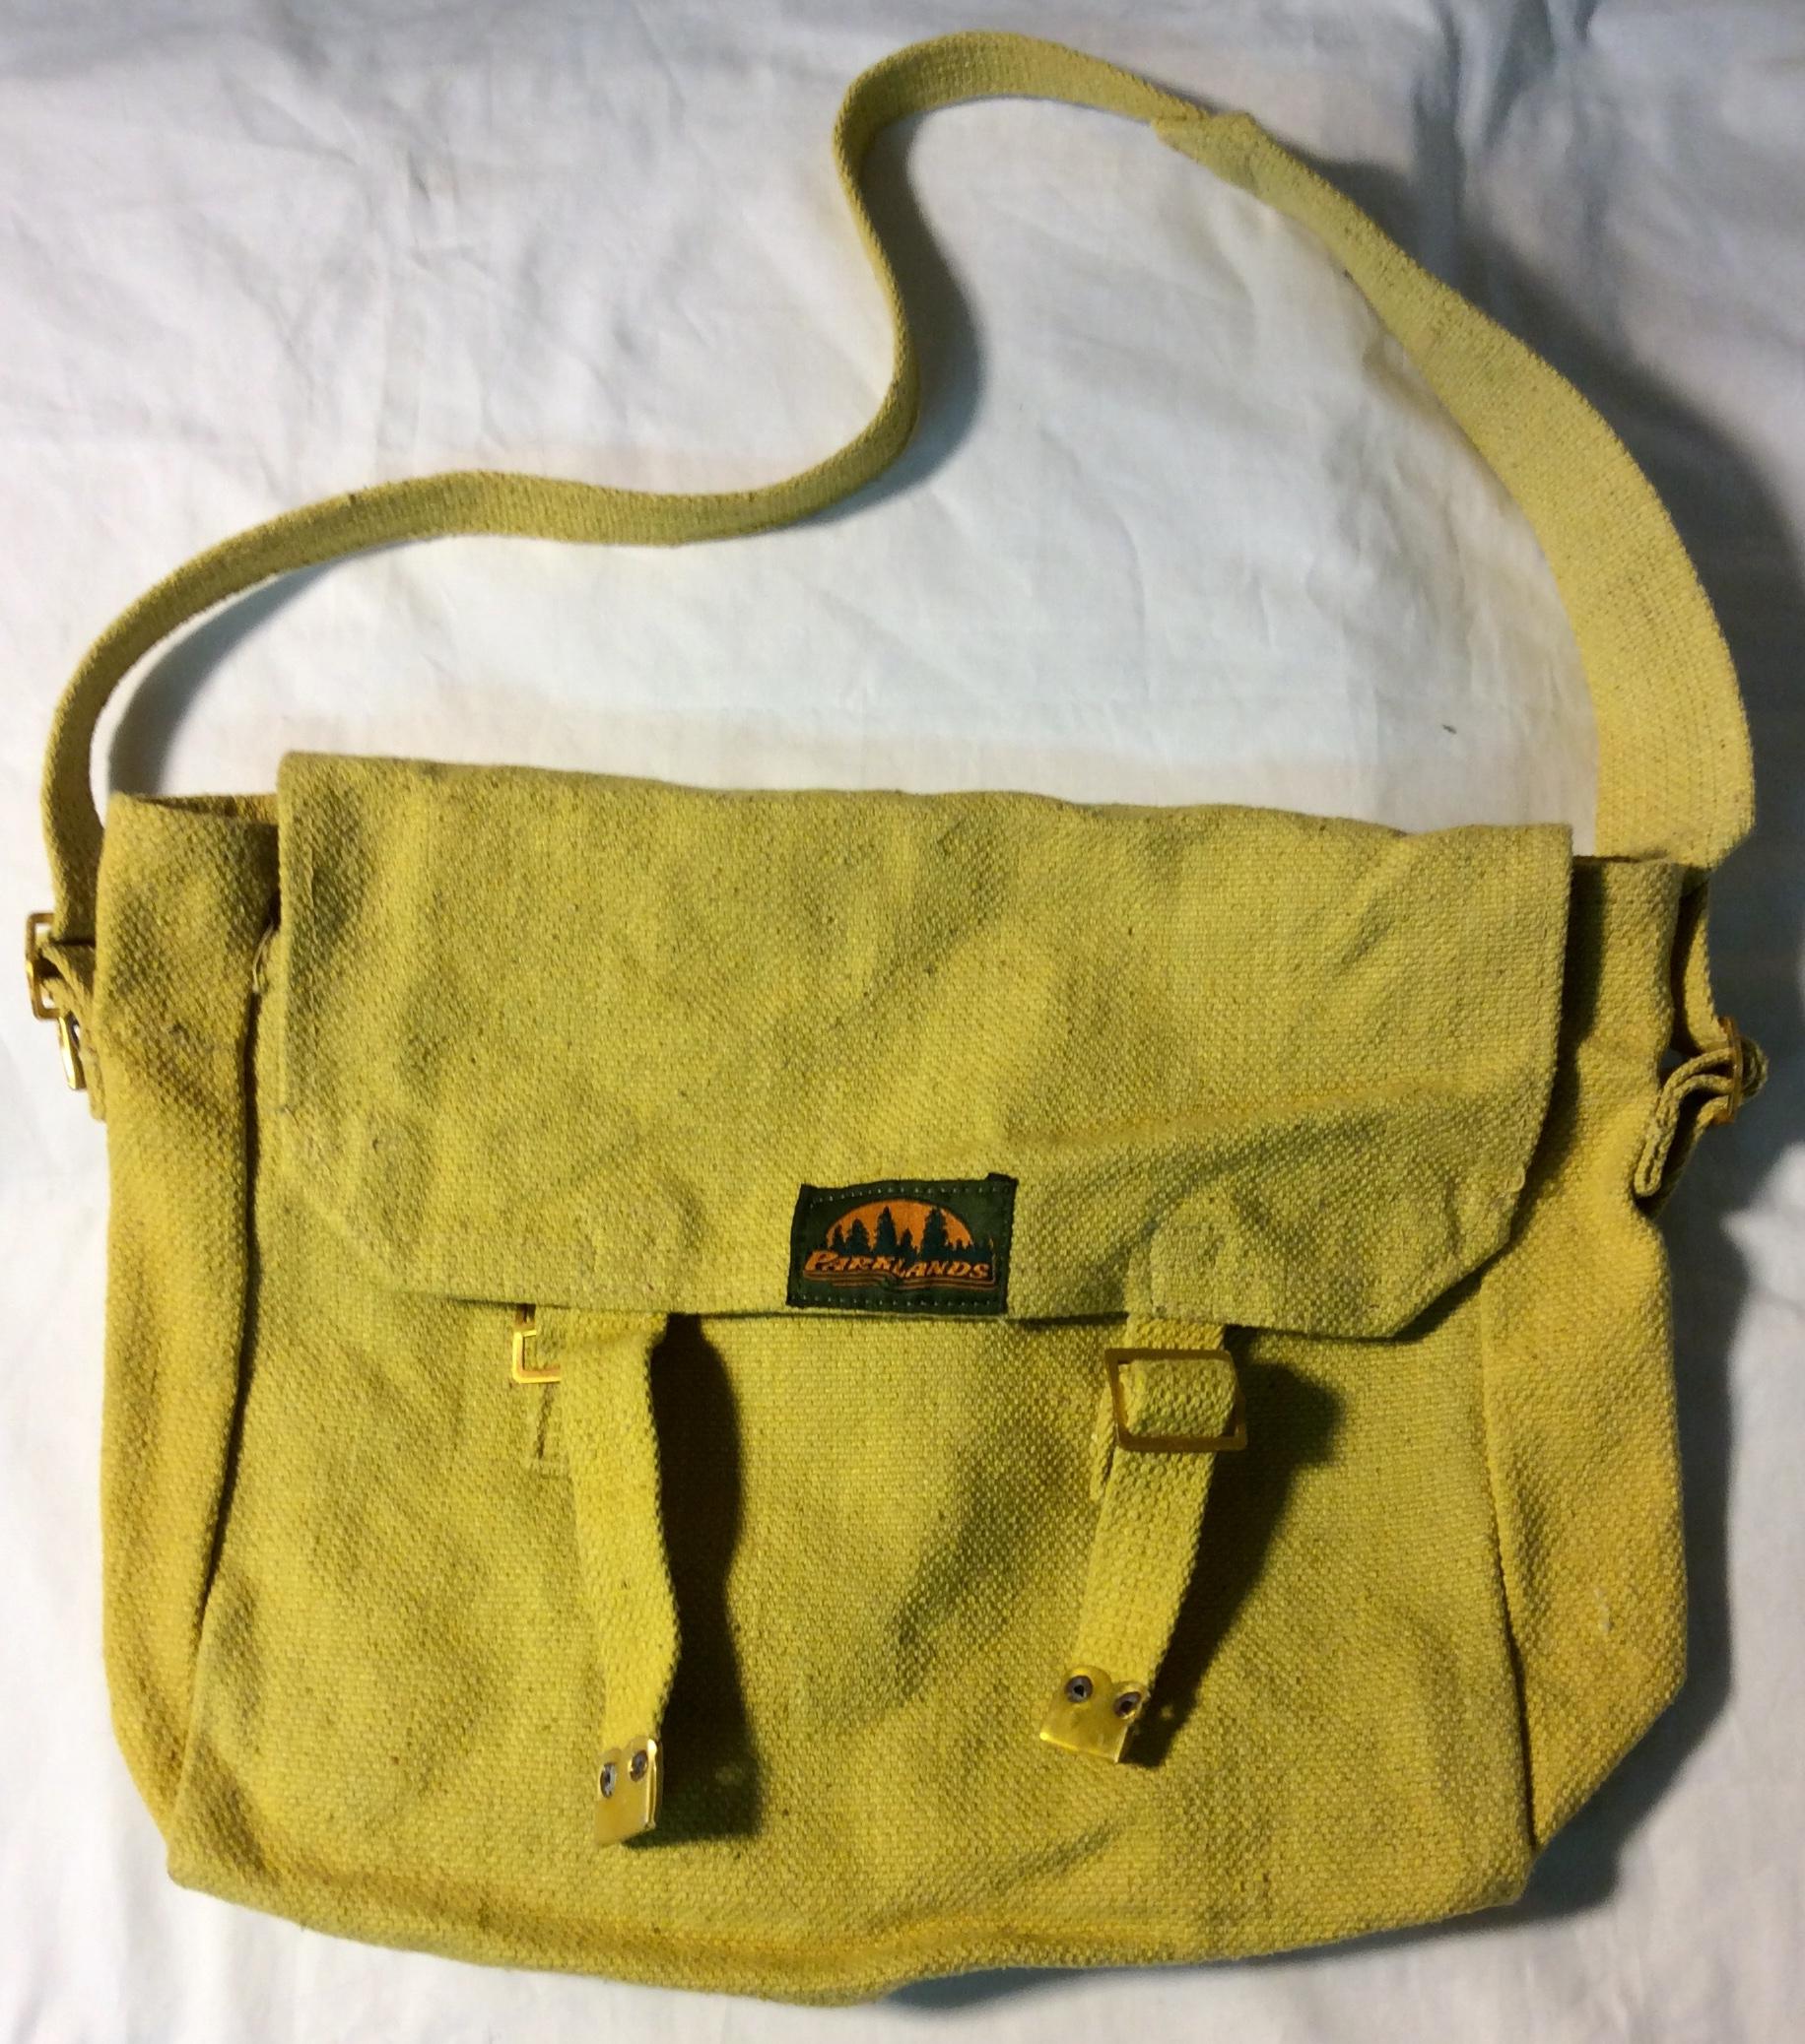 Parklands Yellow woven bag